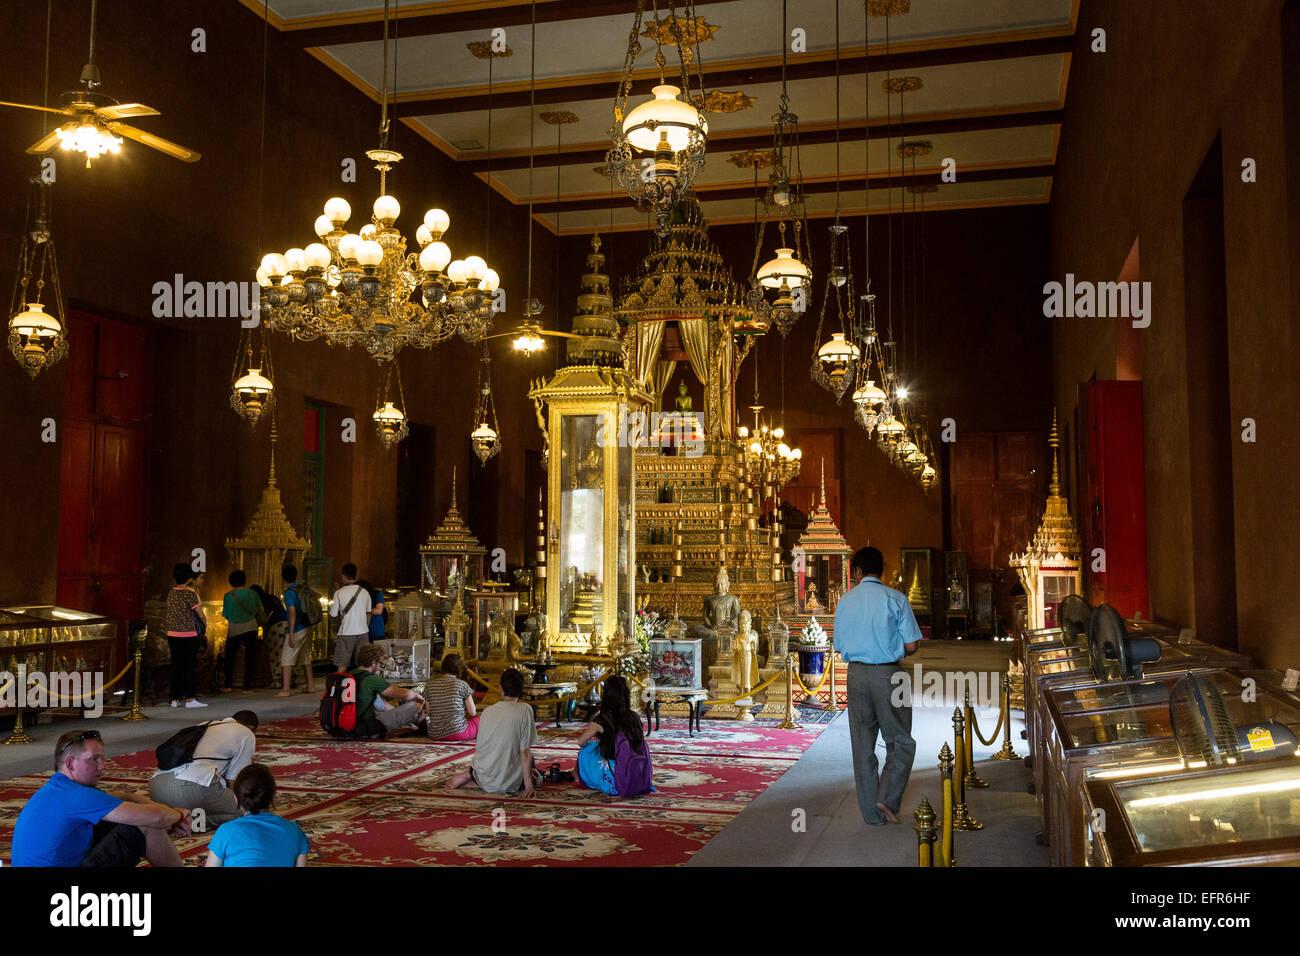 Inside the Silver Pagoda, Royal Palace, Phnom Penh, Cambodia. - Stock Image